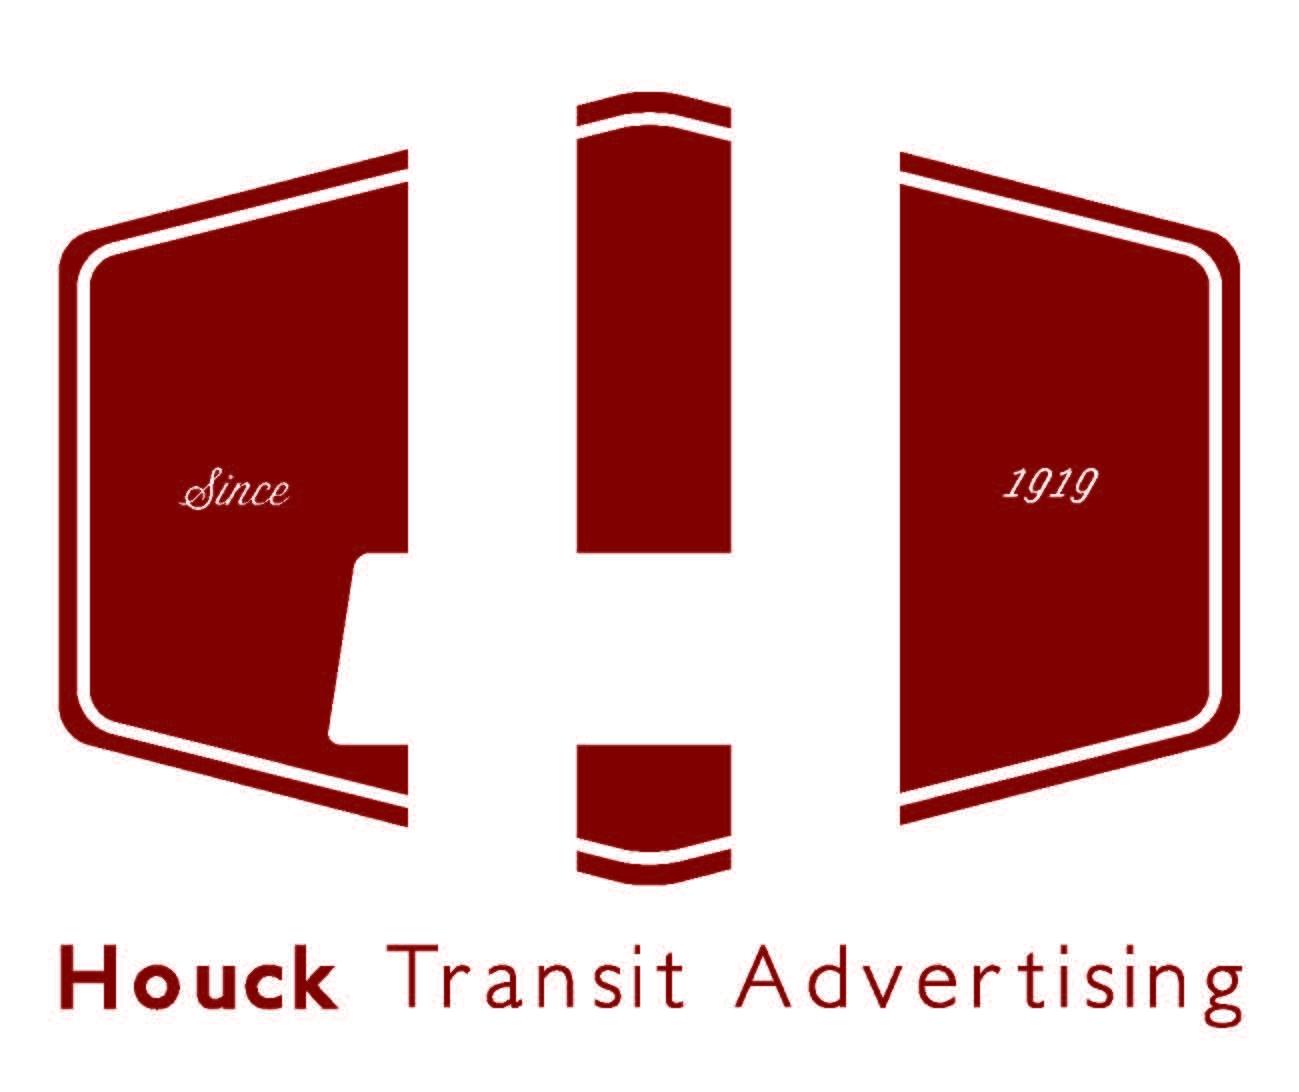 Houck Transit Advertising